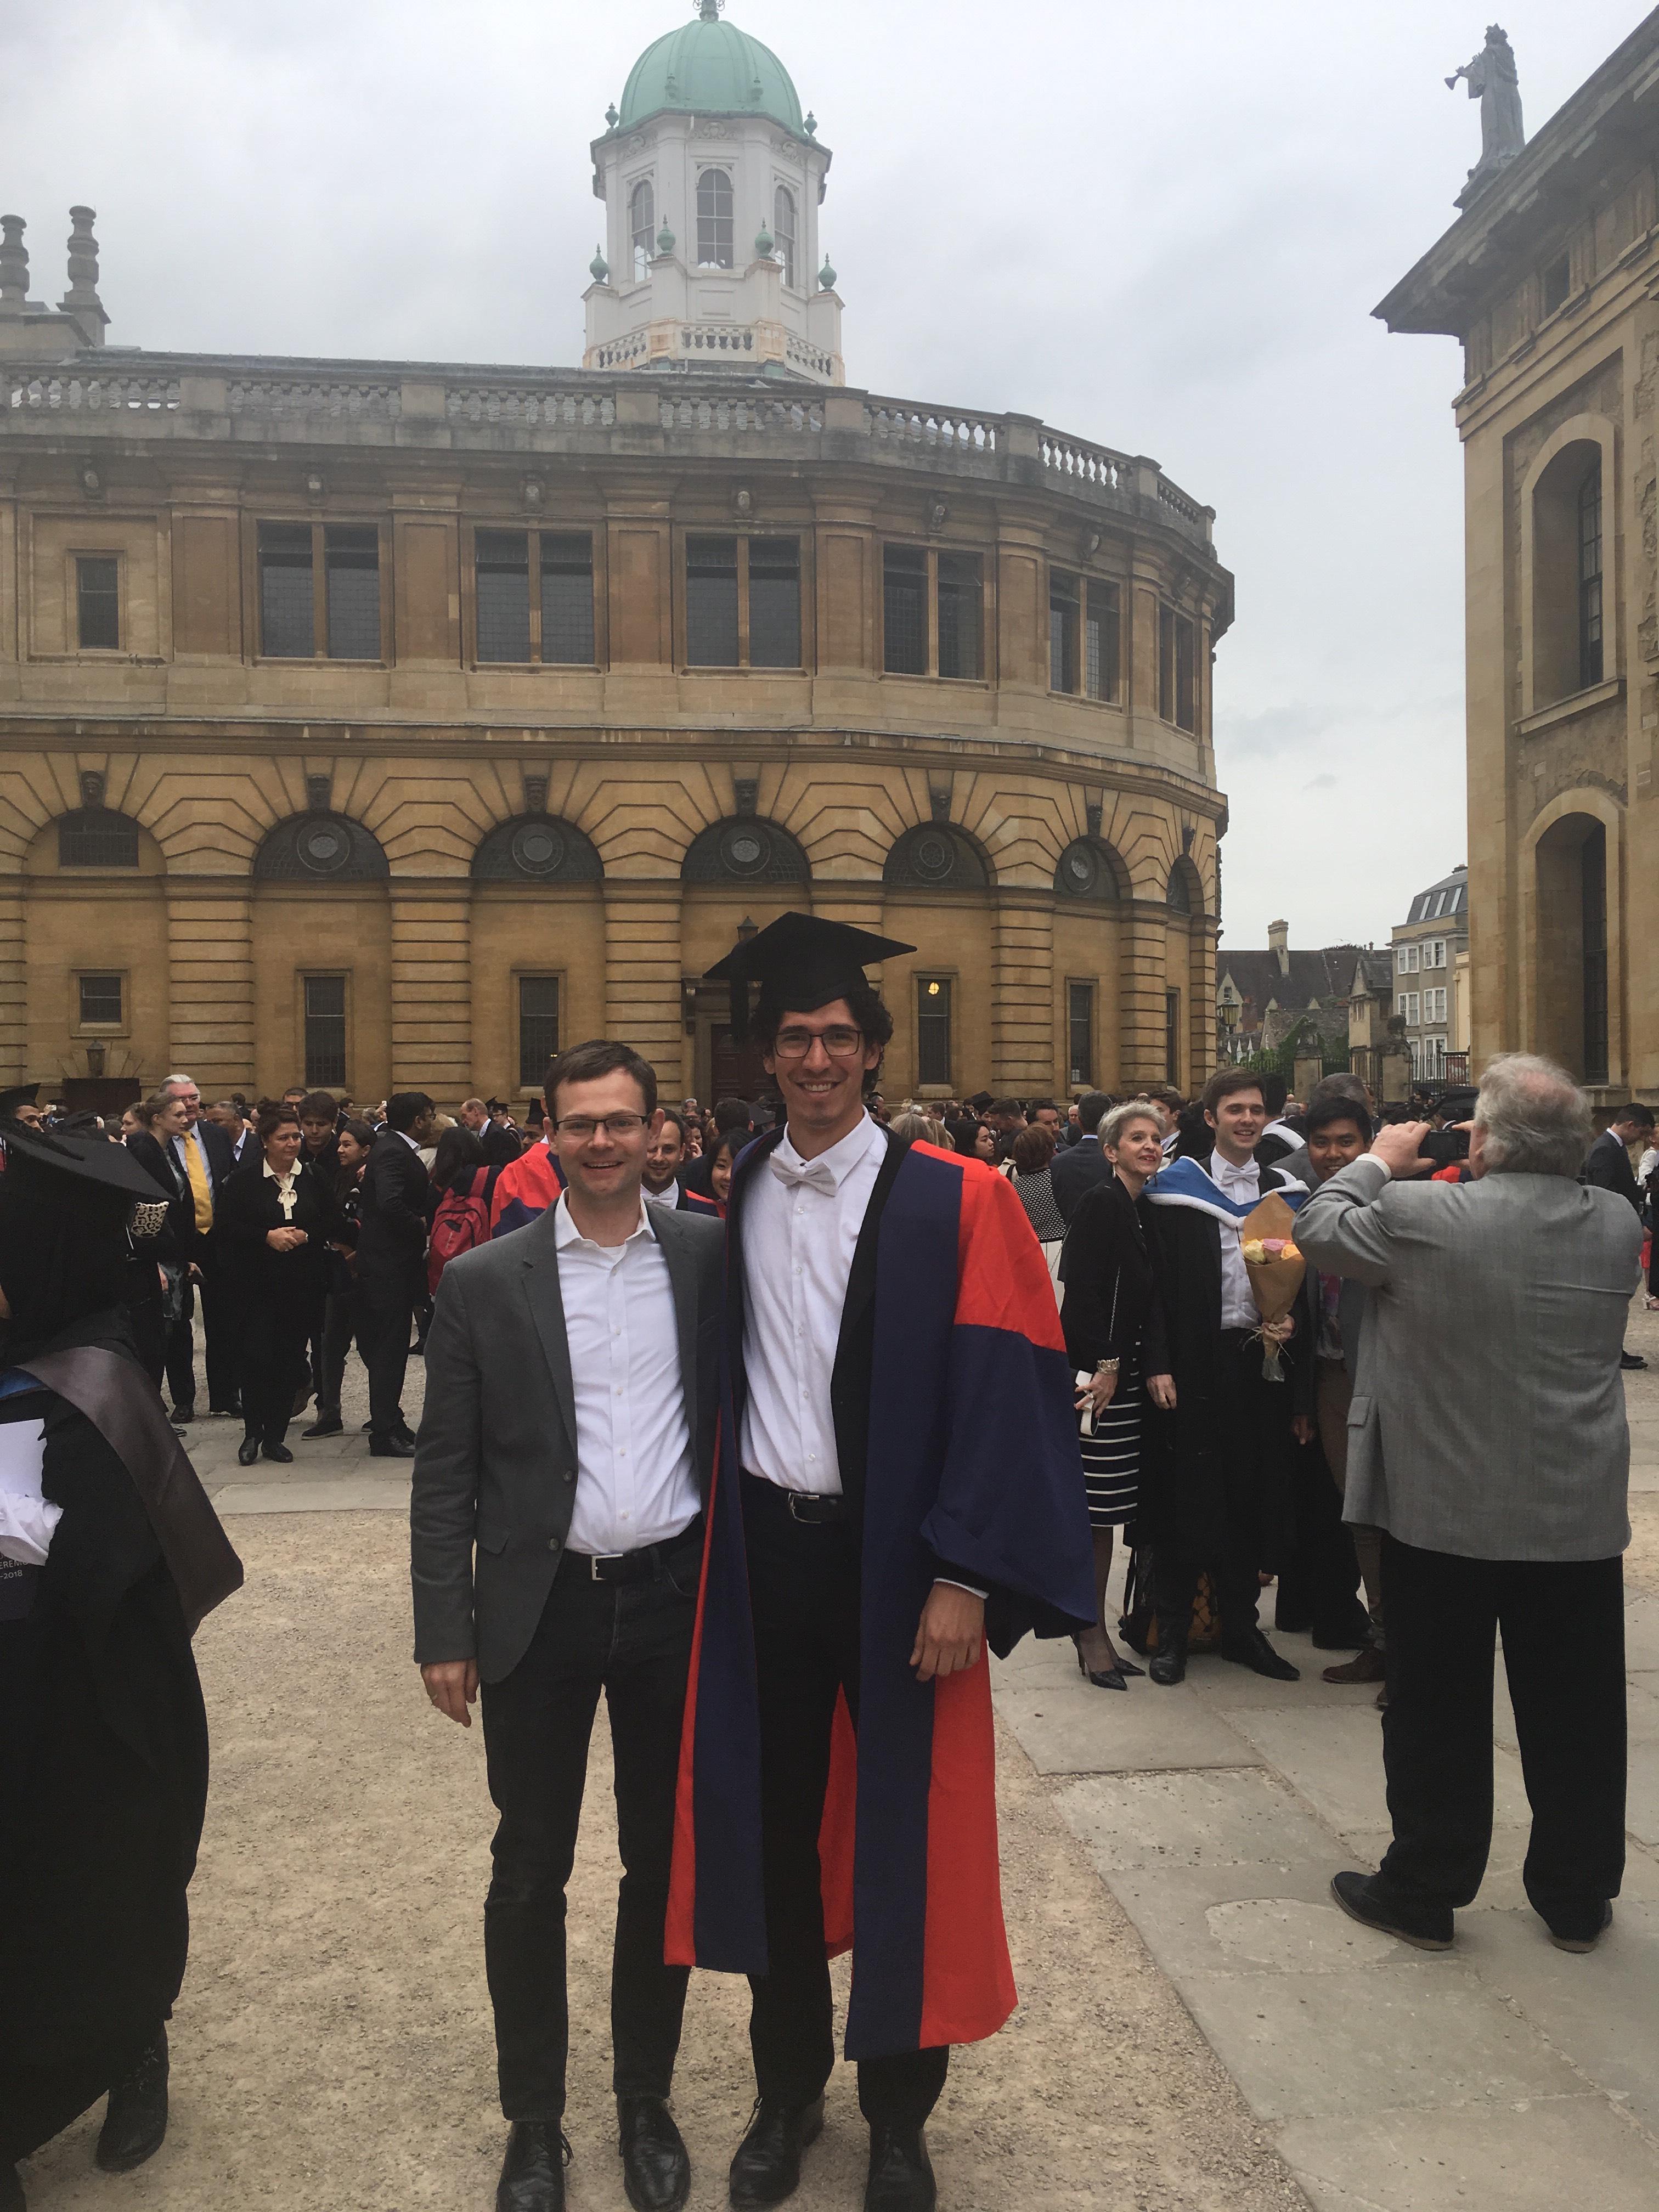 Gregorio_graduation.jpeg